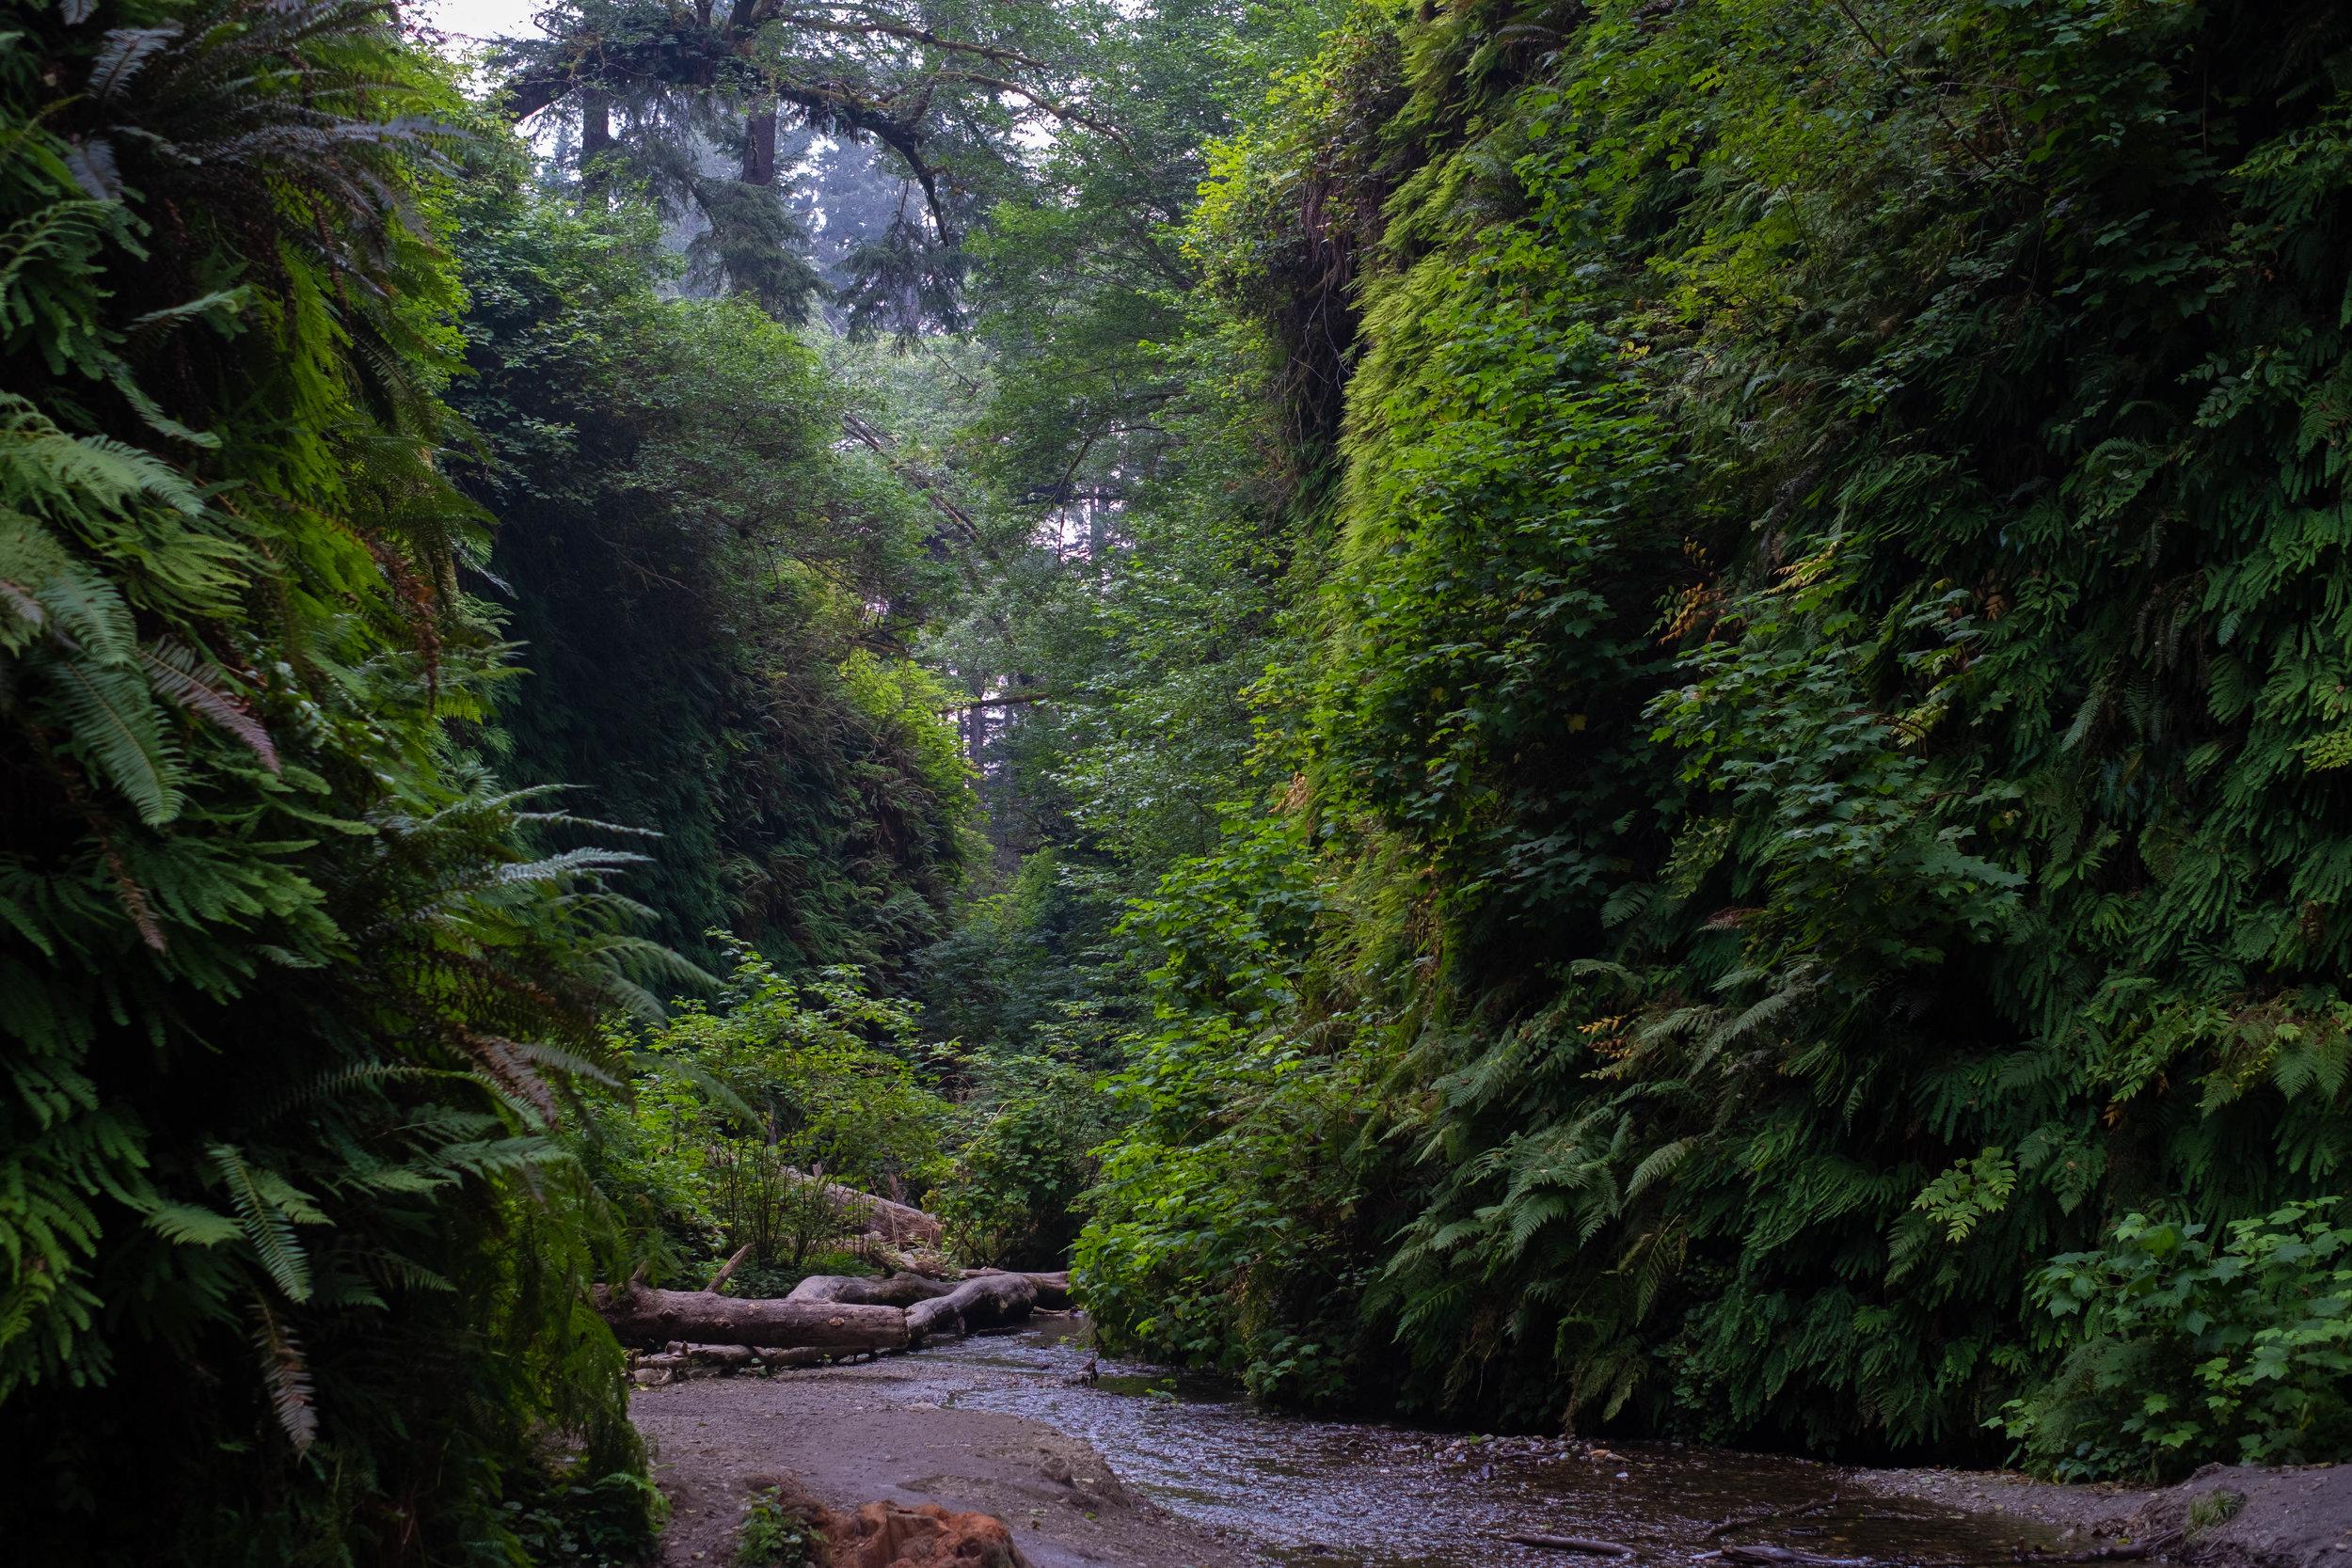 prairie creek redwoods  | Jakee Zaccor | Jacqueline Zaccor | JZaccor Designs